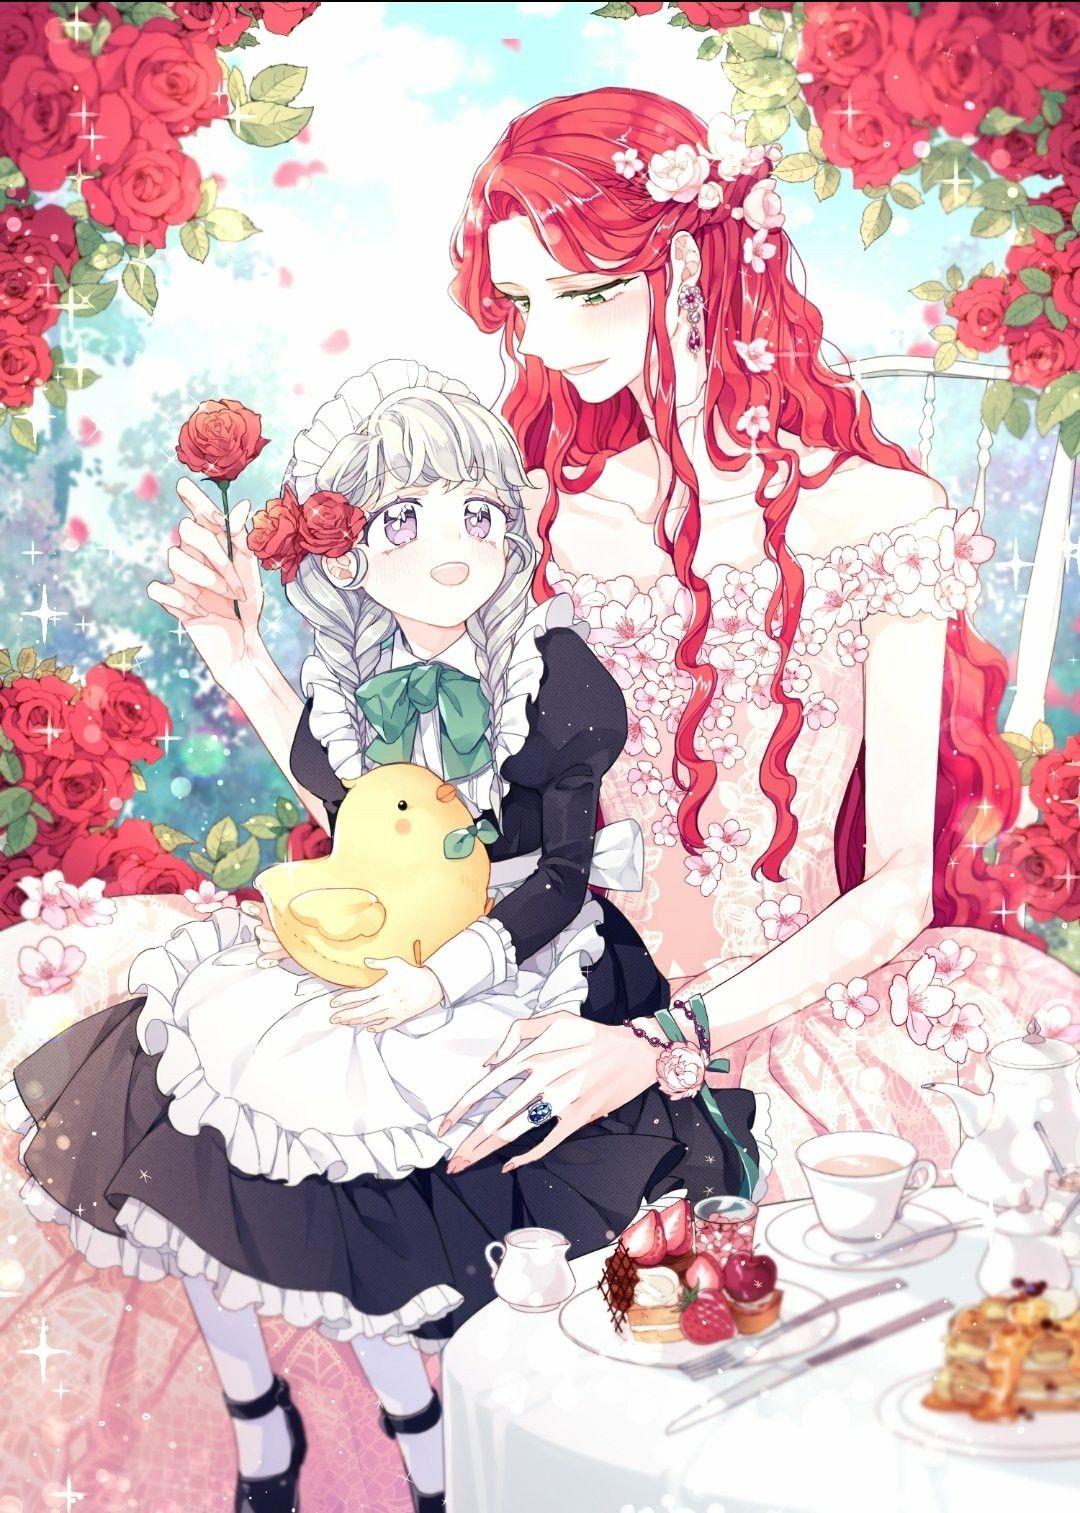 The Evil Empress Adores Me In 2021 Romantic Anime Anime Family Kawaii Anime